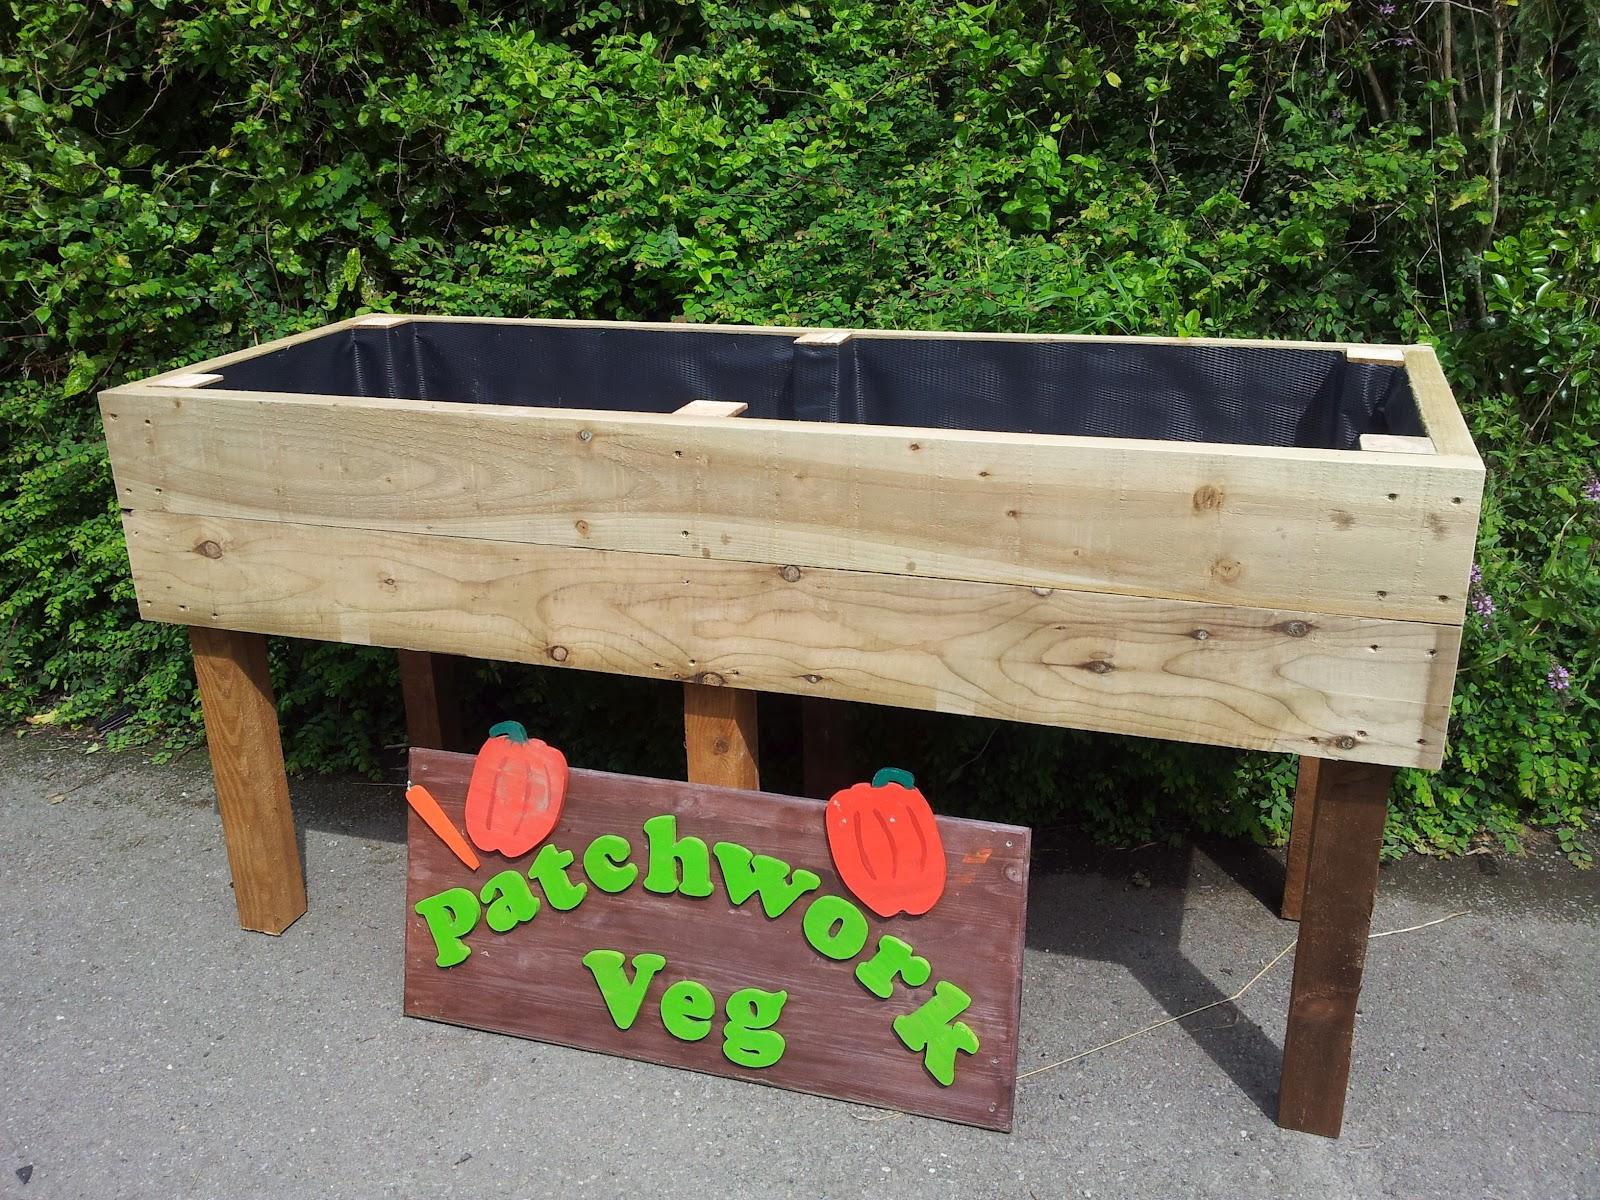 patchworkveg - gardeners vegetable growing website, premium raised